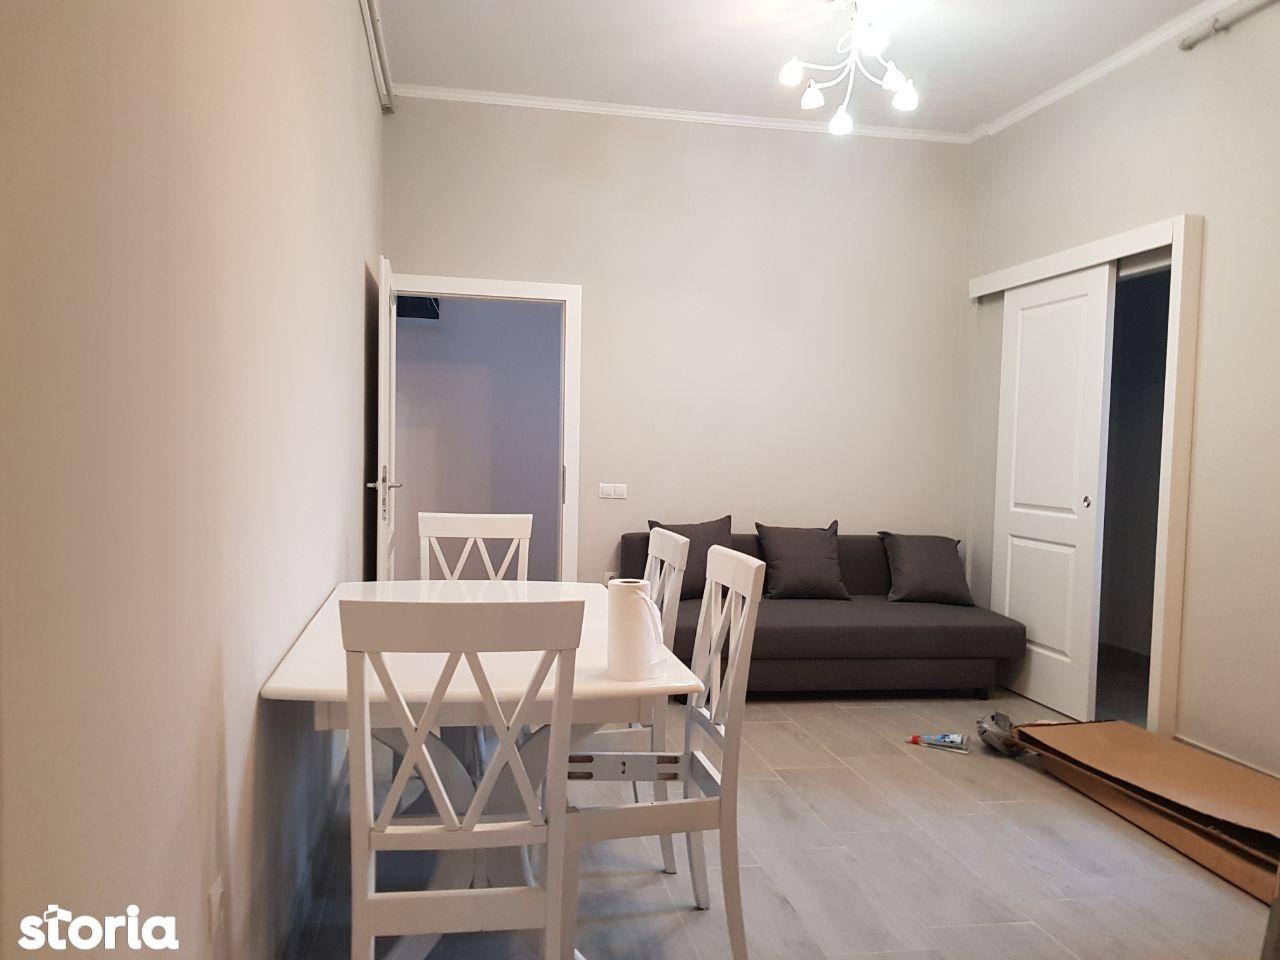 Apartament 3 camere + mansarda, de vanzare, Oradea str. Mimozei